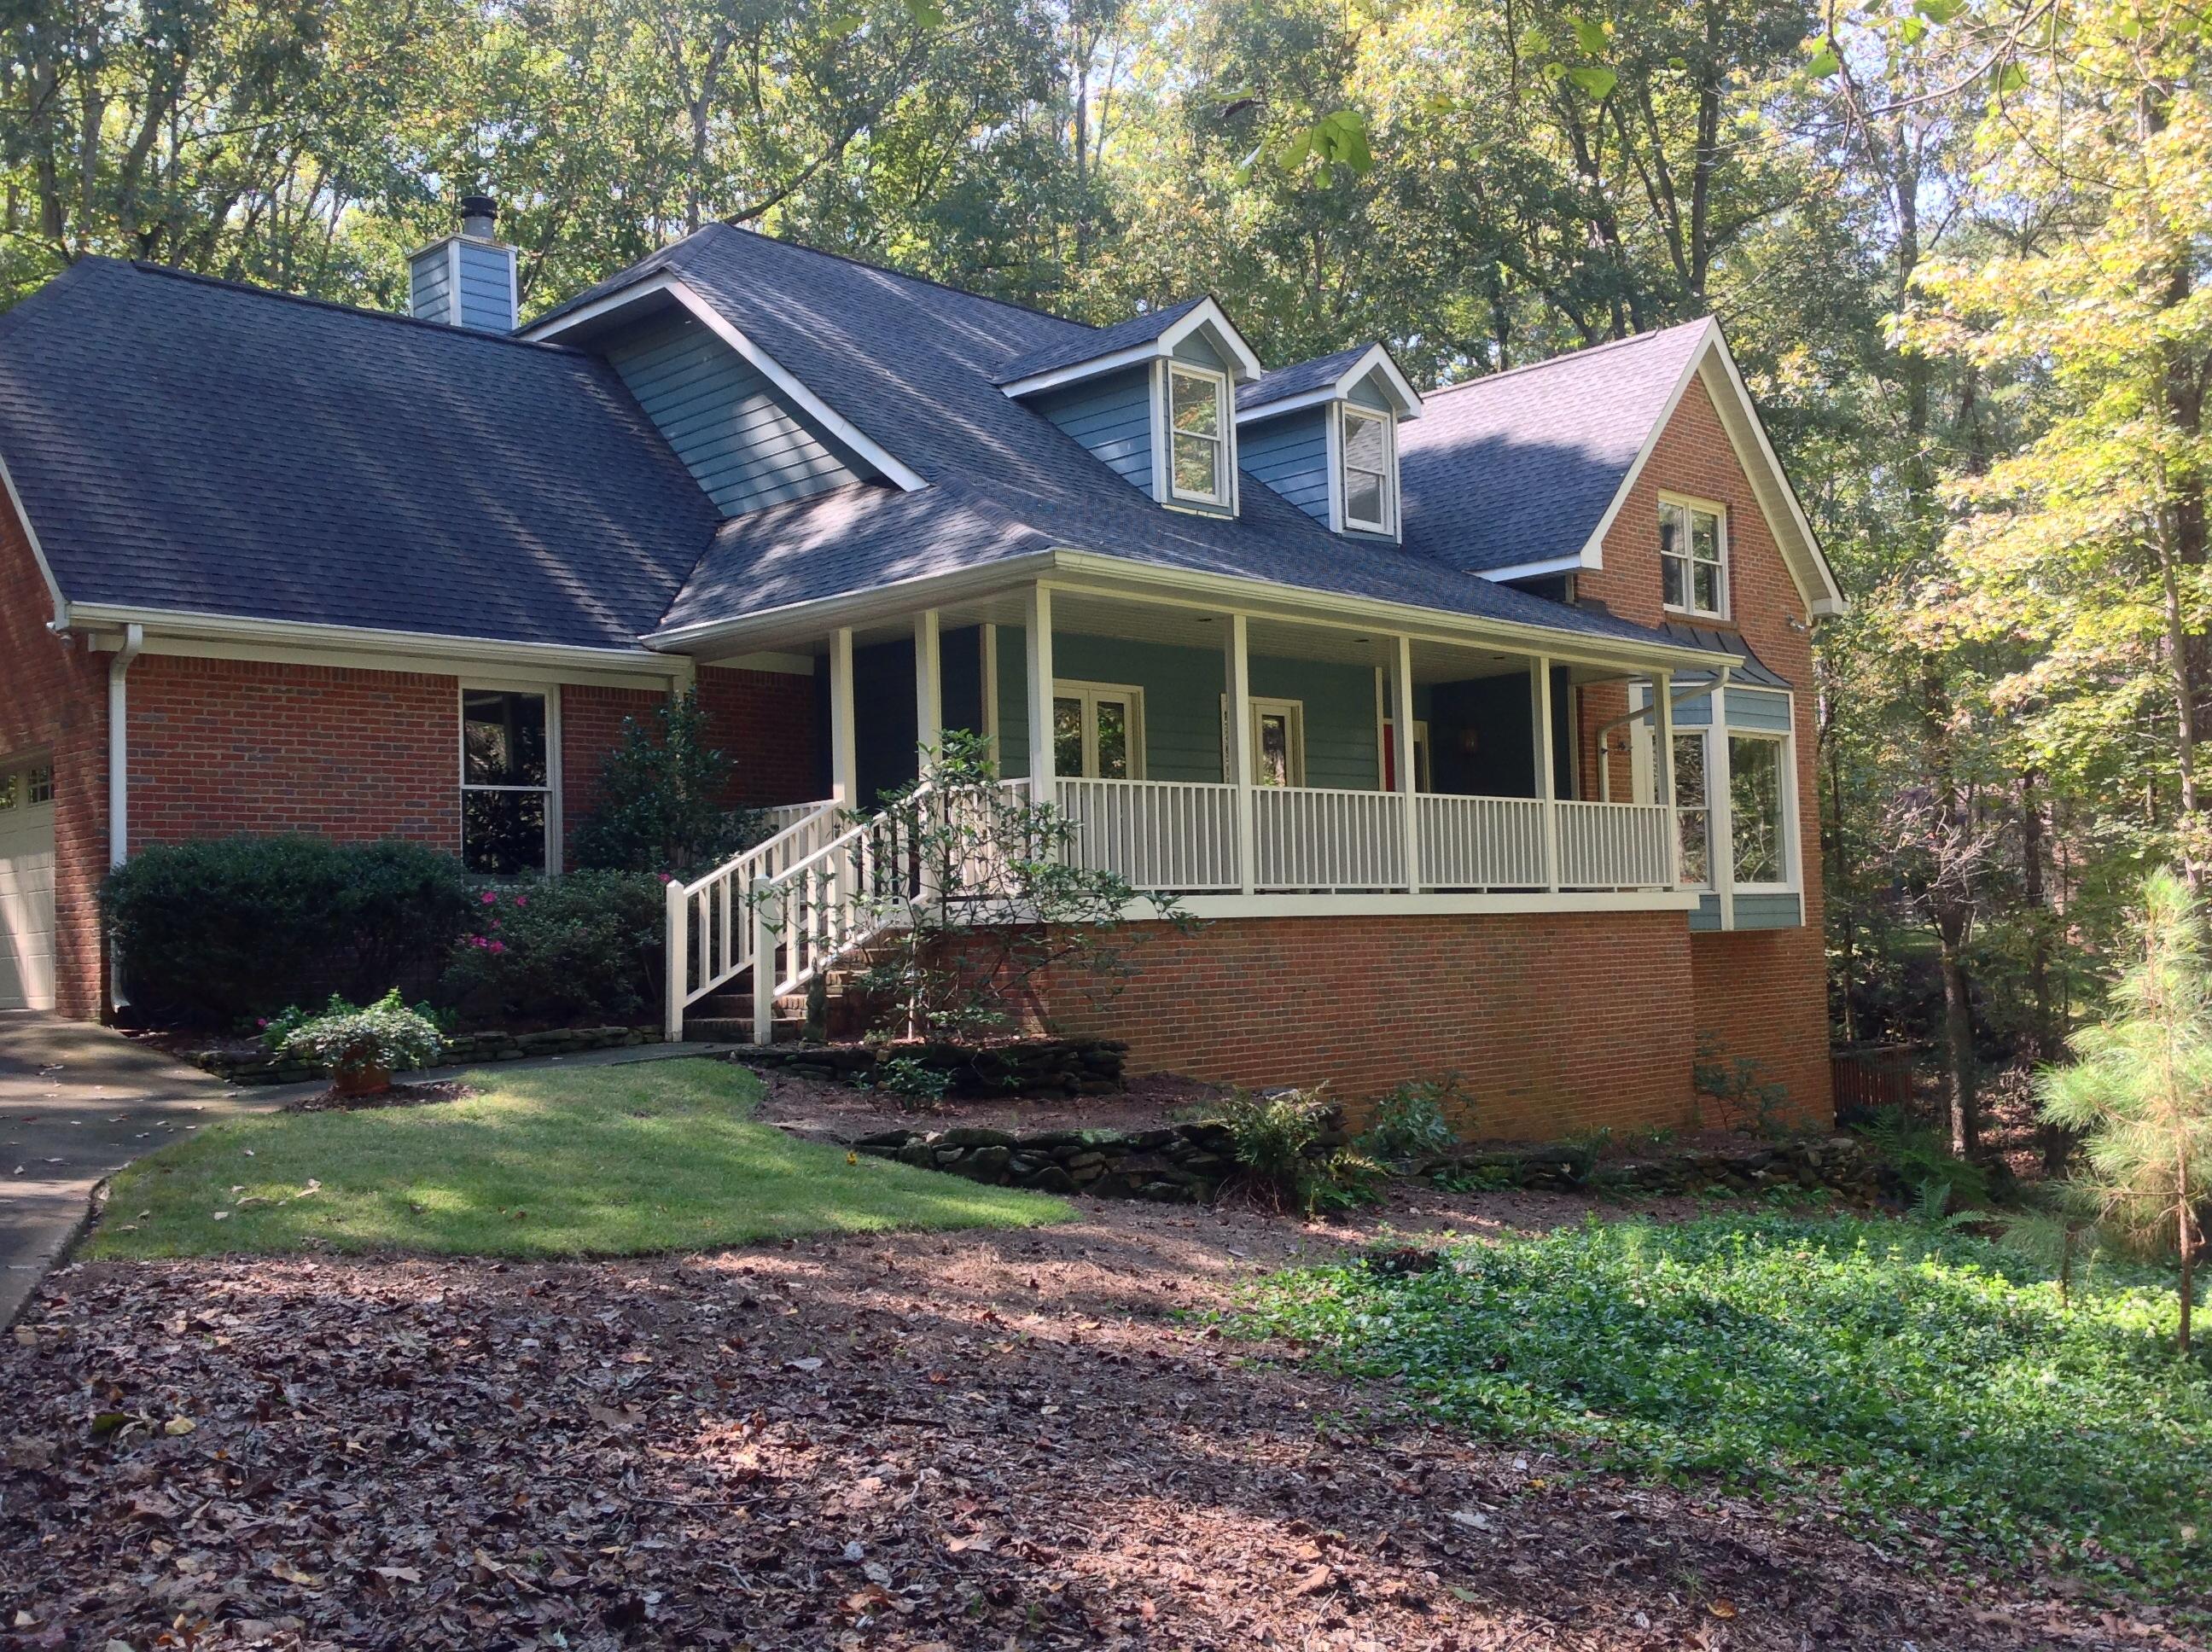 独户住宅 为 销售 在 Impressive Home in Johns Creek 430 Link Road Johns Creek, 乔治亚州, 30022 美国